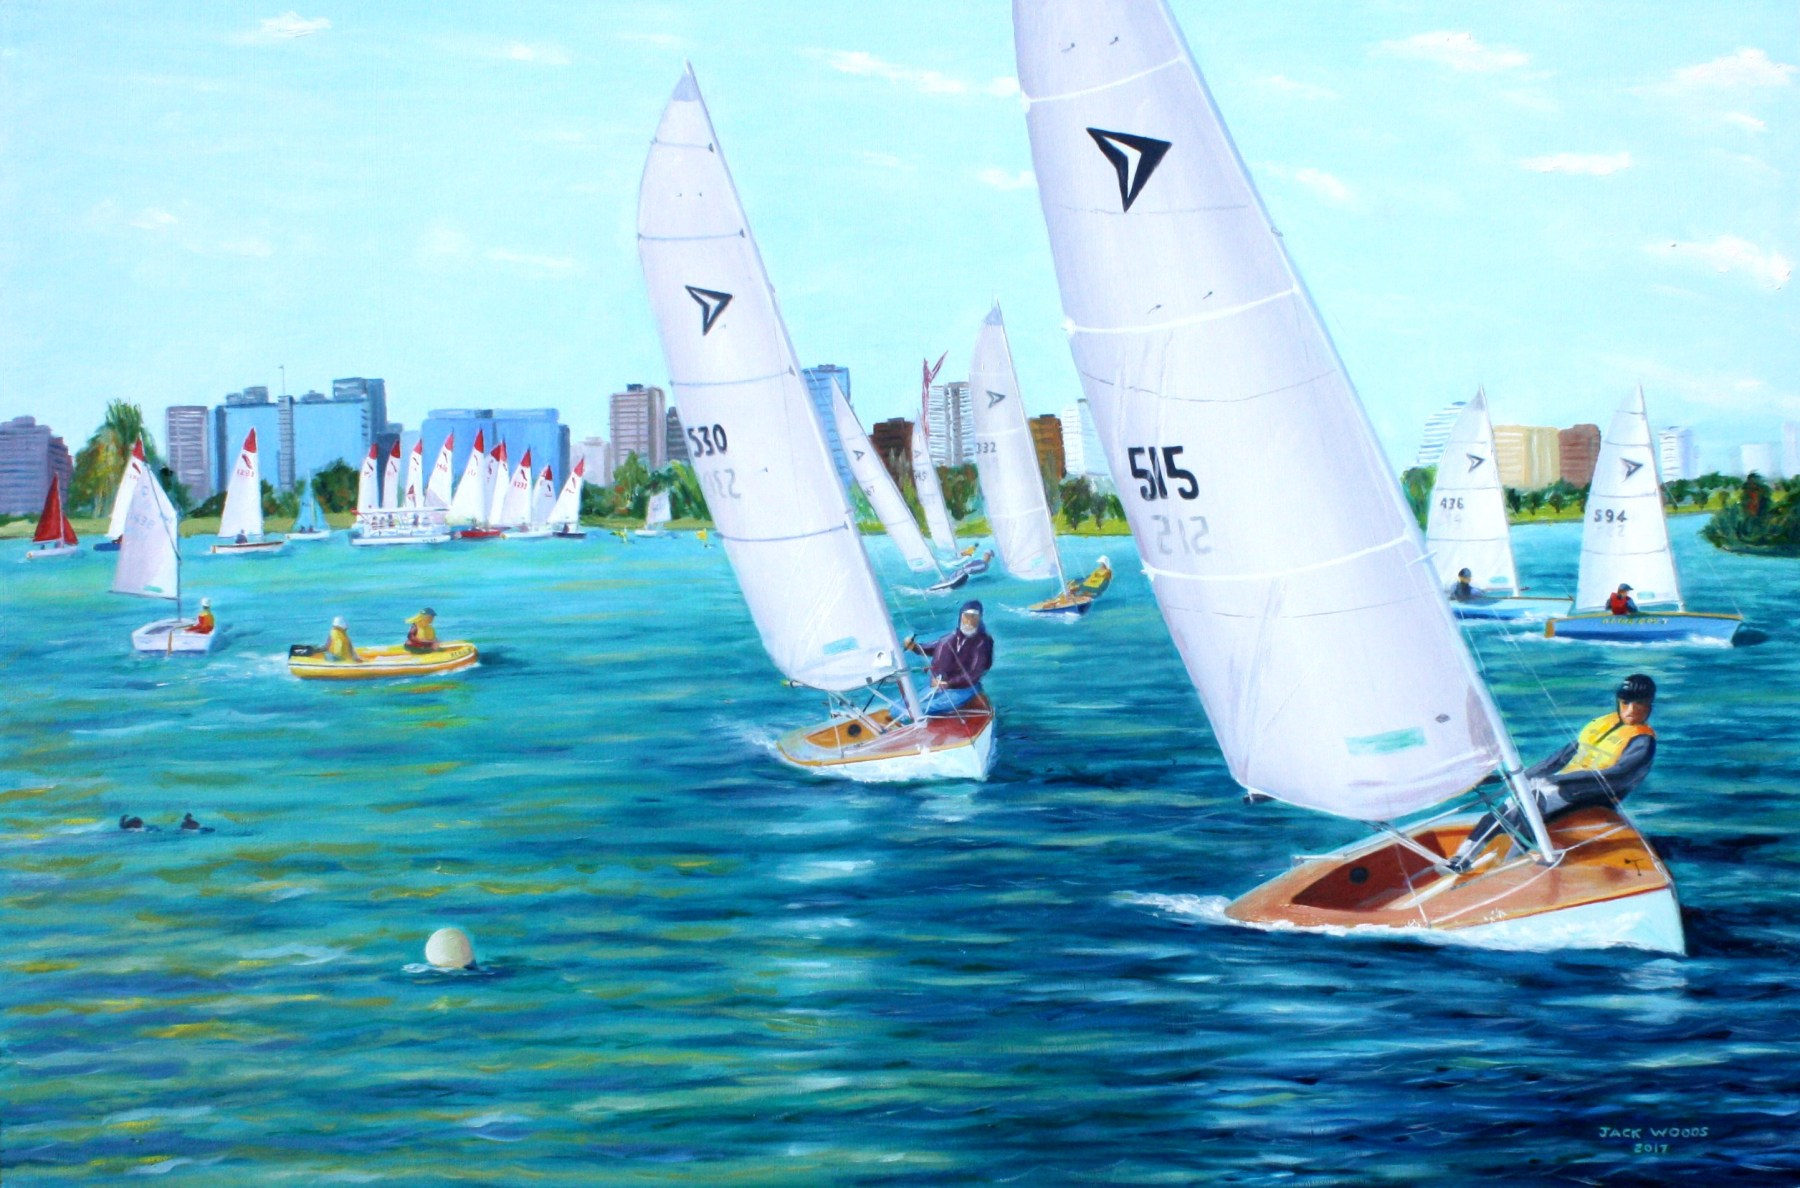 racing albert park lake Impulse dinghy seapainting jack woods marine artist